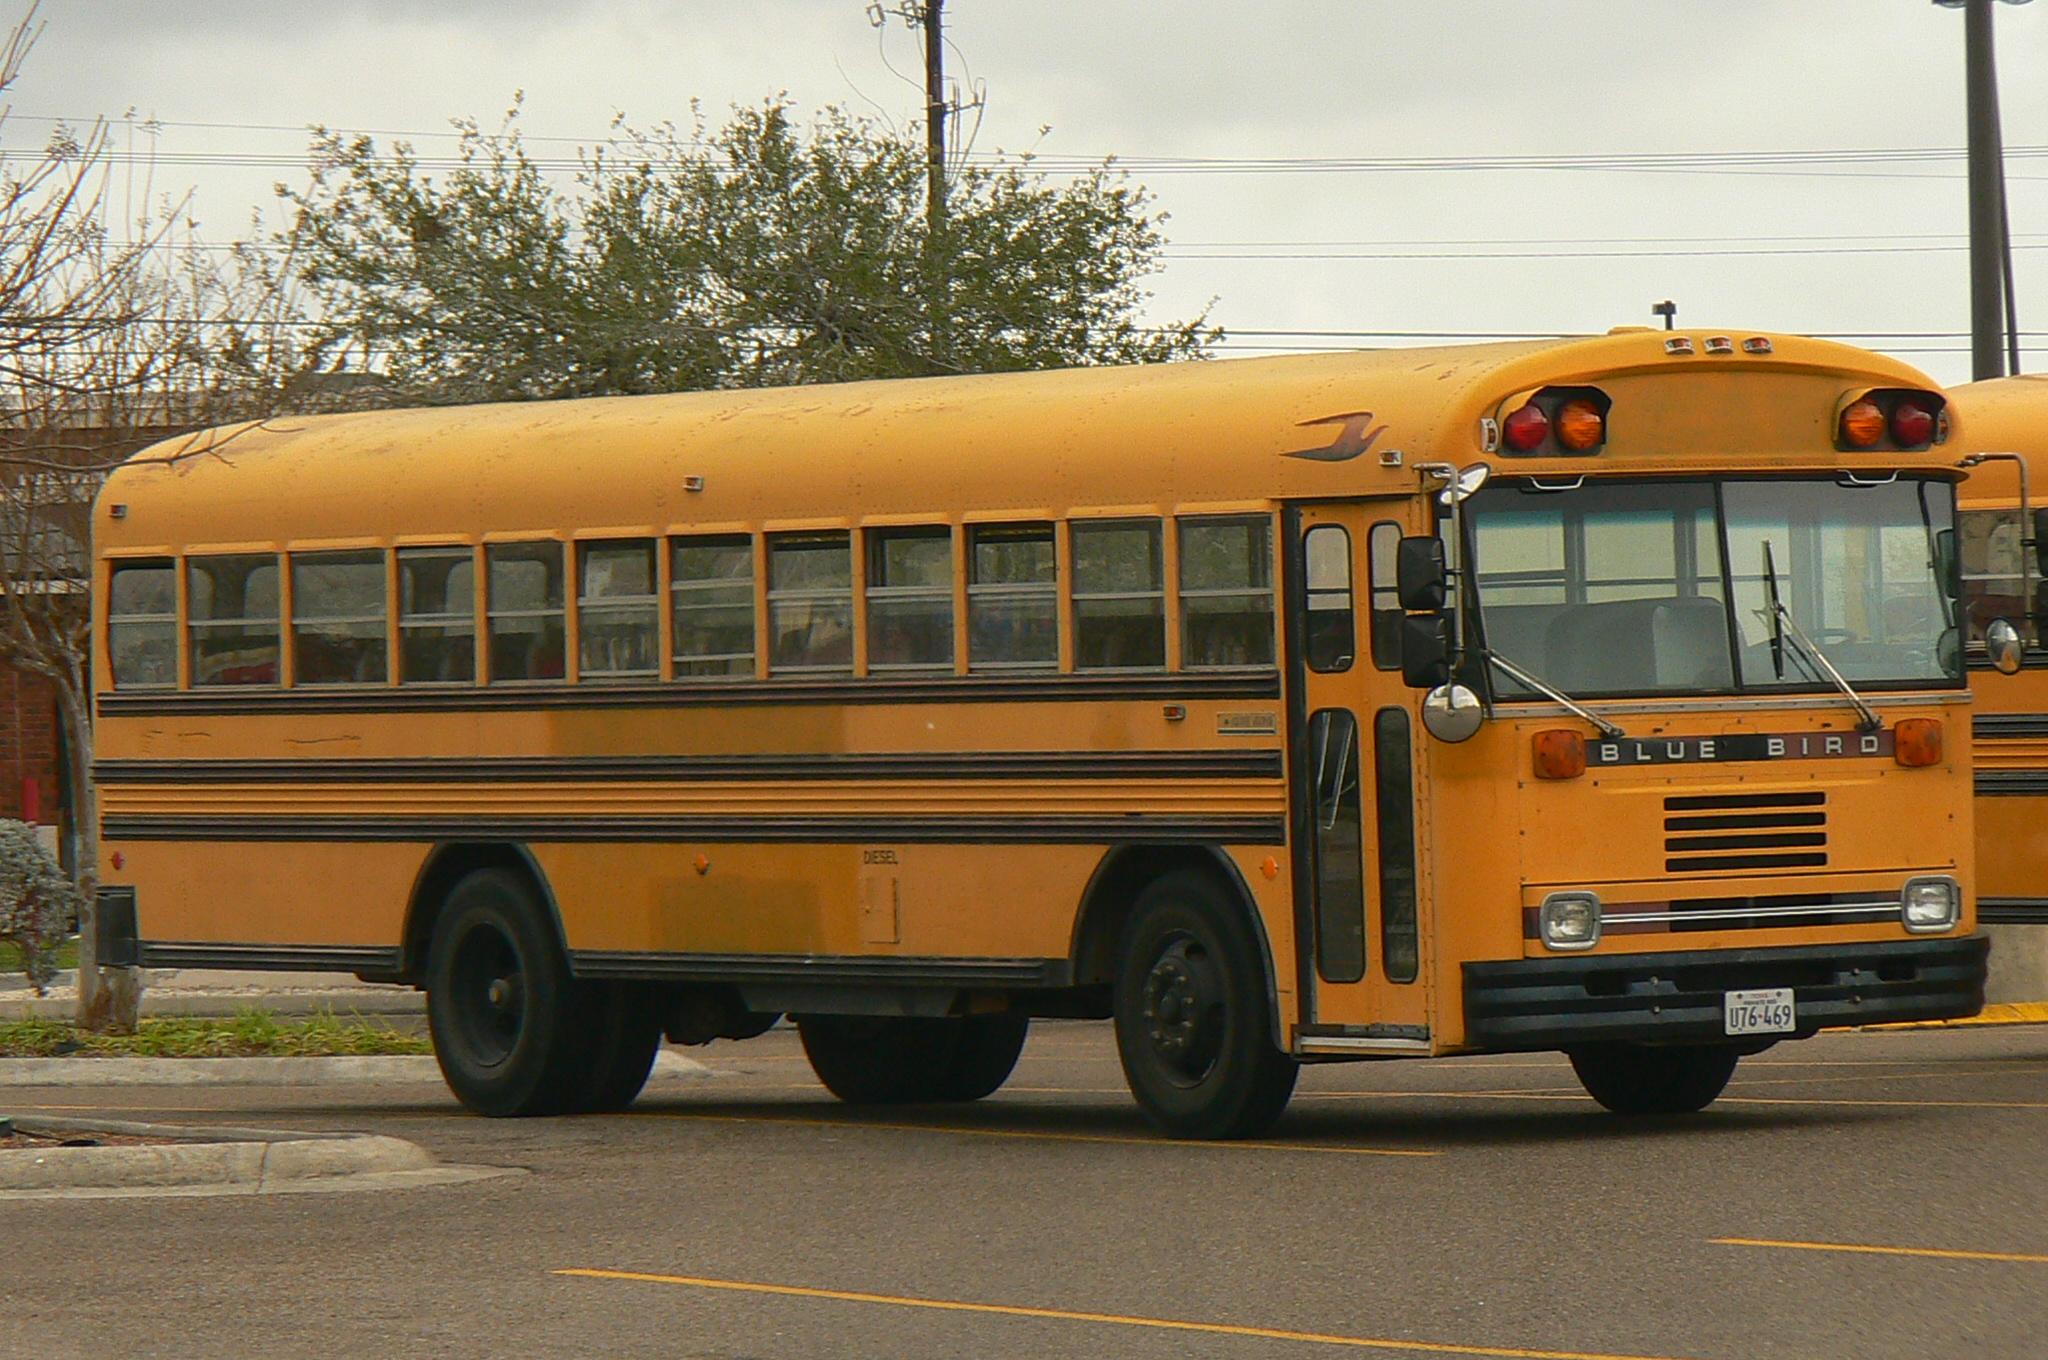 Wiring Harness 1987 Chevy Bluebird School Bus Trusted Wiring Diagram \u2022 Bluebird  Bus Exhaust System Bluebird Bus Wiring Diagram 1987 Chevy